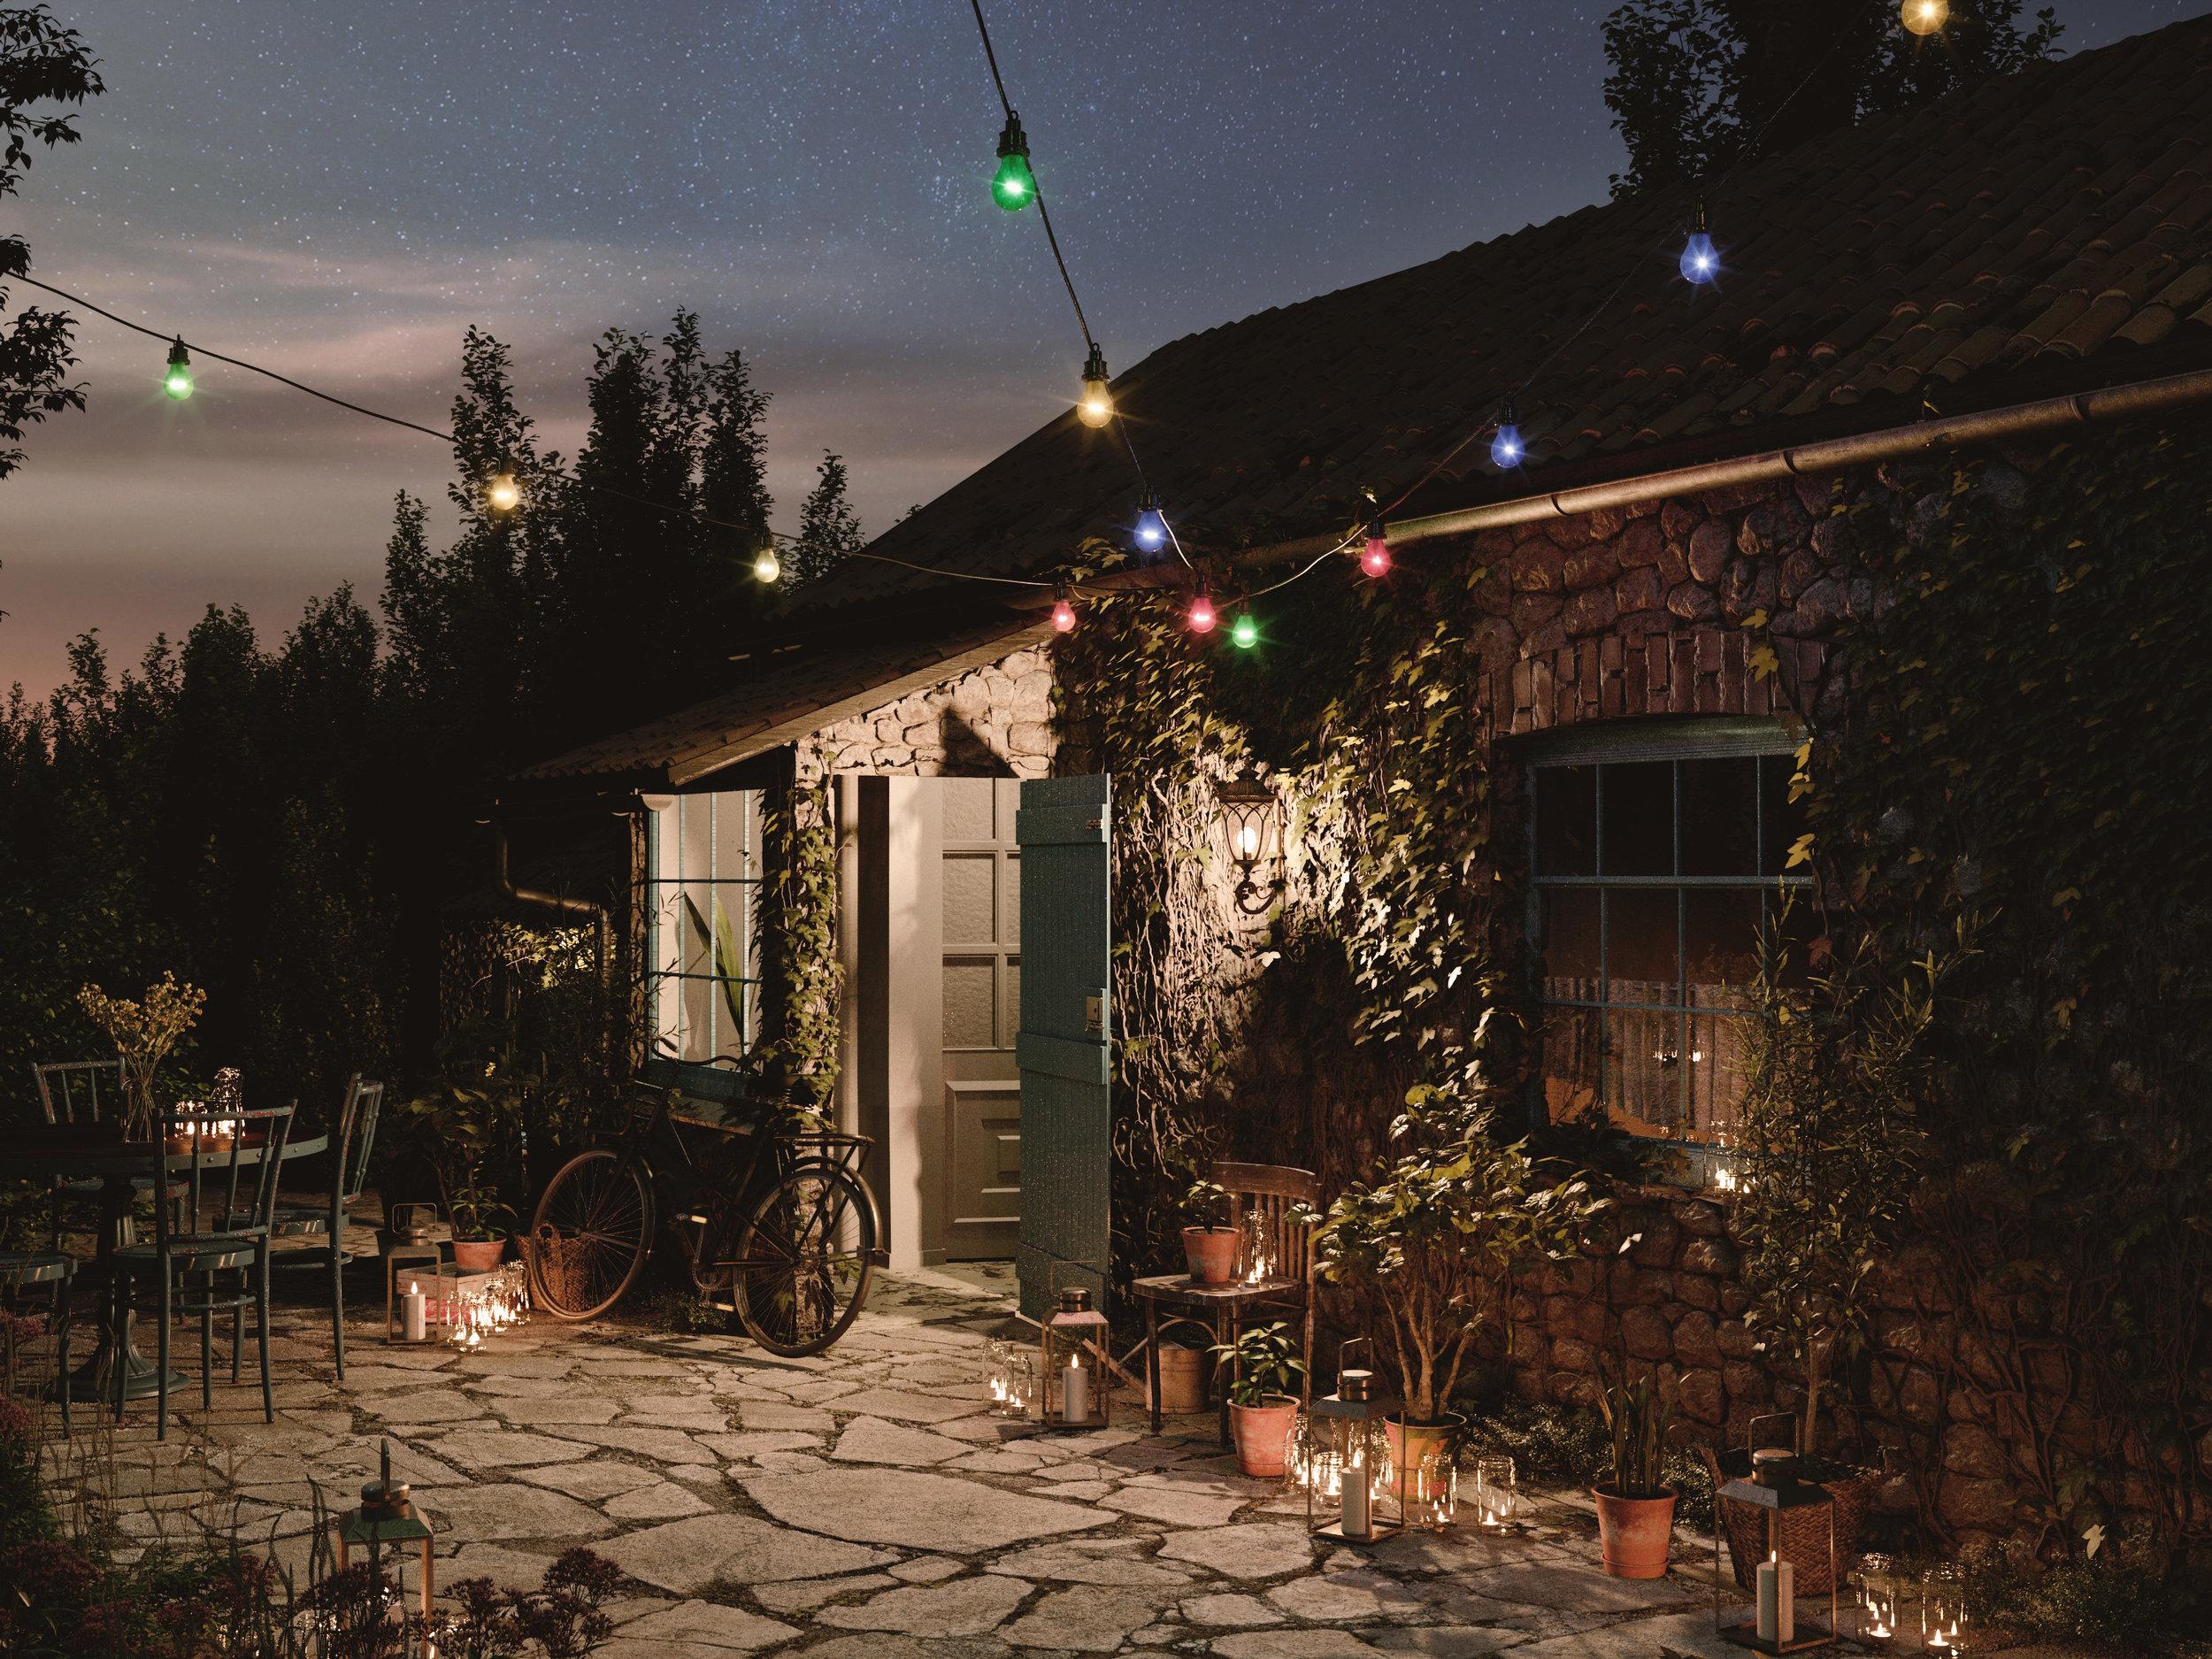 ALTSHIFT_The_Cottage_Night.jpg